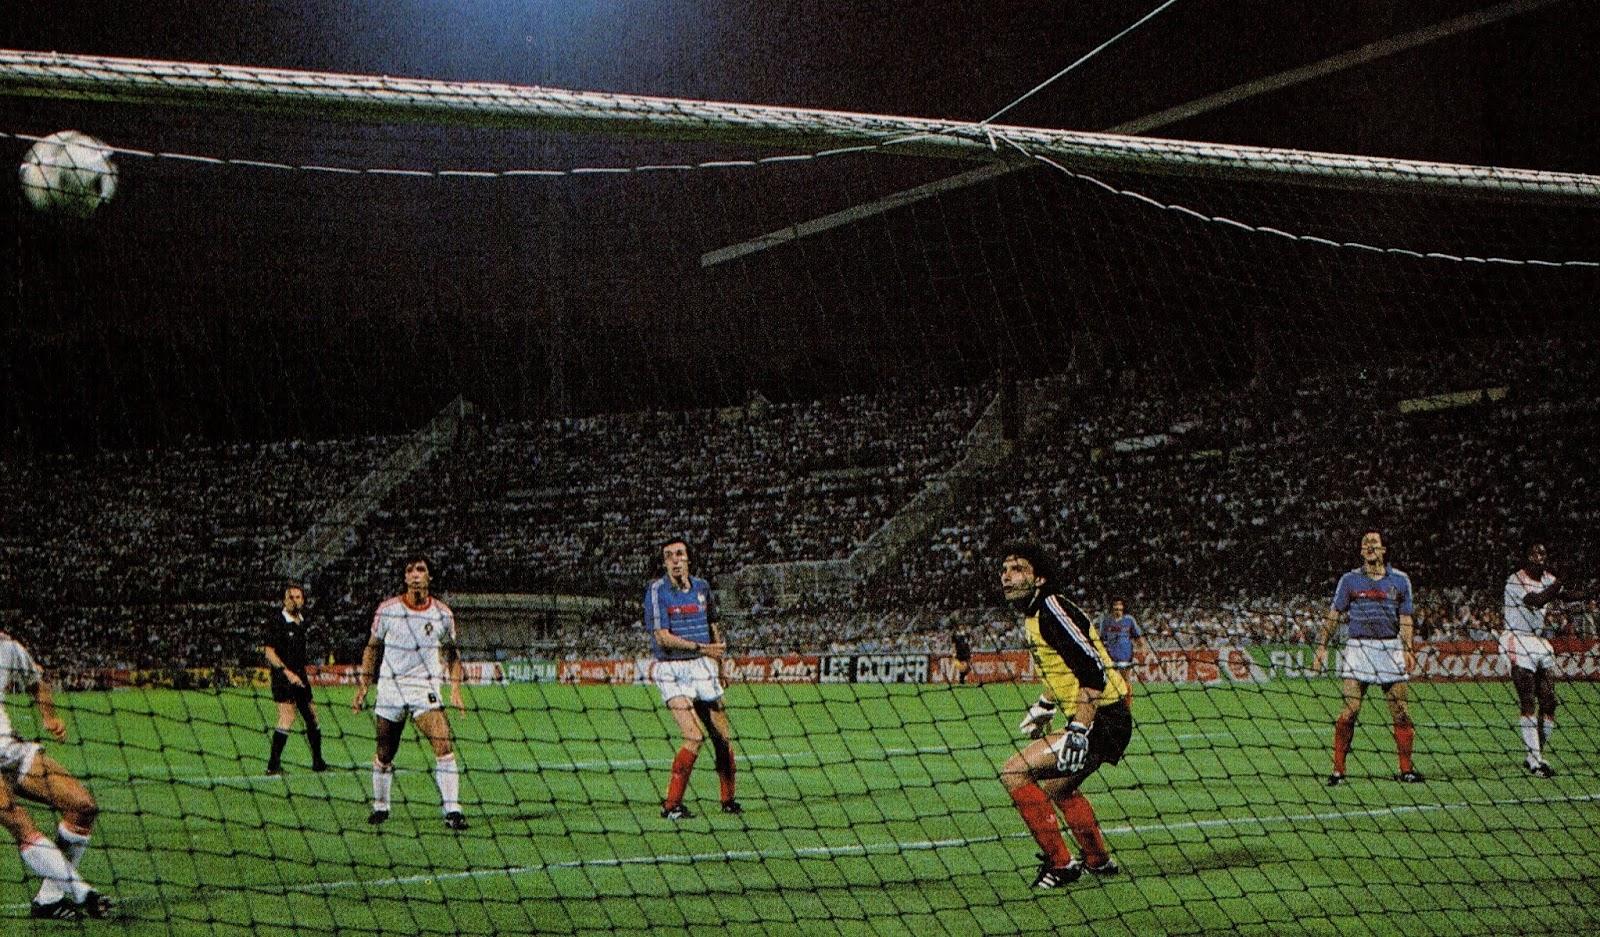 idokapszula_1984_franciaorszagi_labdarugo_europa-bajnoksag_elodontok_es_a_donto_franciaorszag_portugalia_rui_jordao.jpg